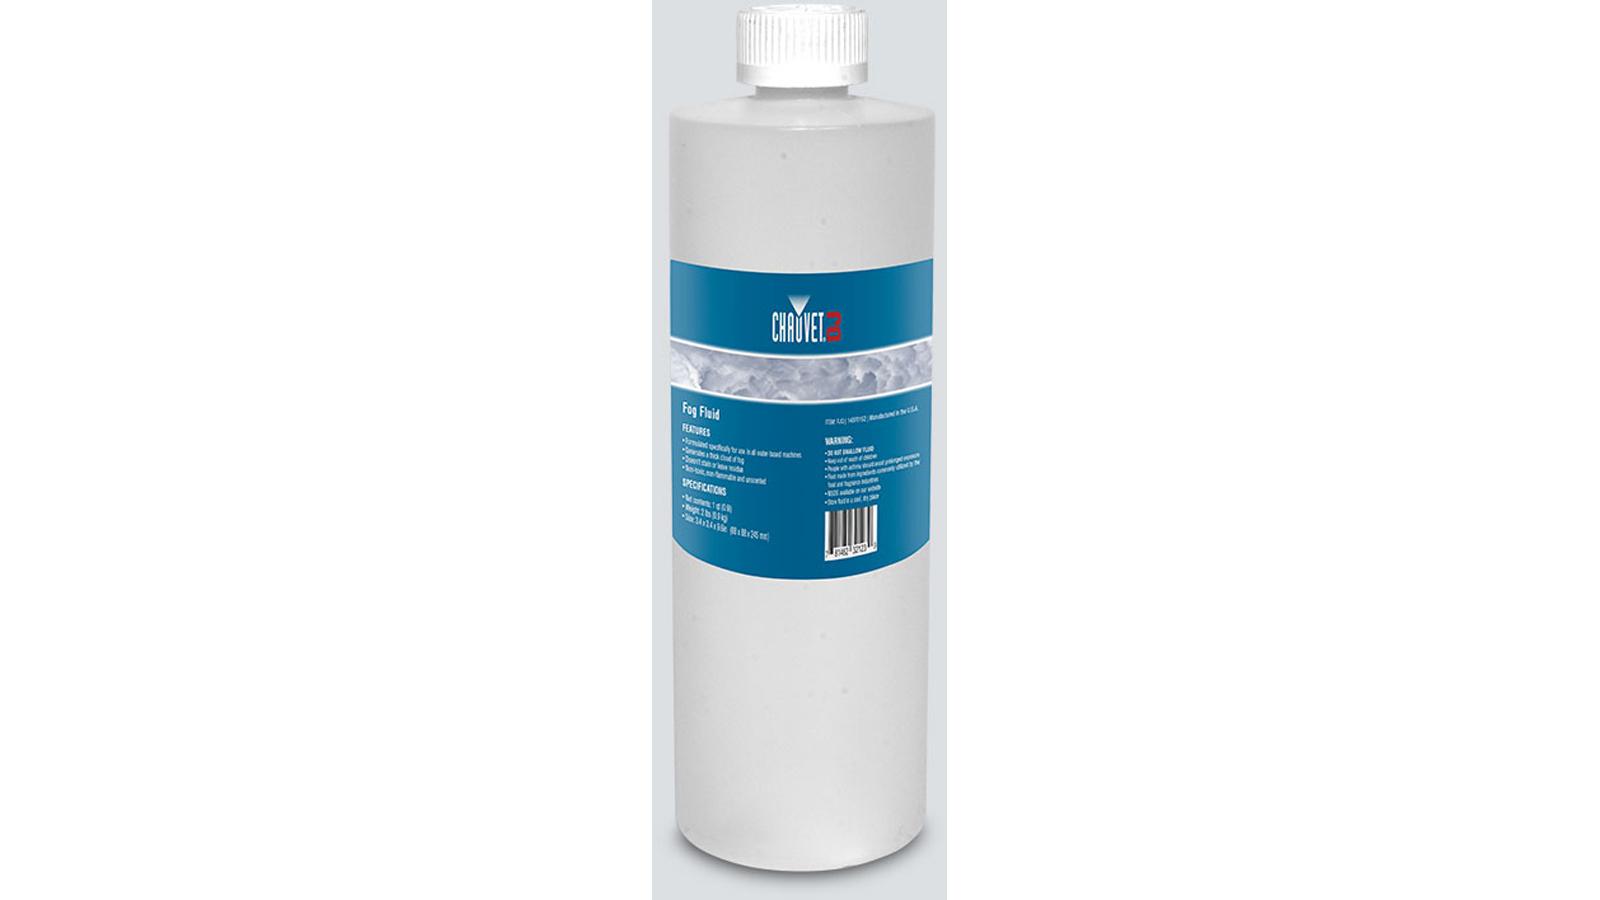 Chauvet Nebelfluid - High Performance Fog Fluid (FJQ)